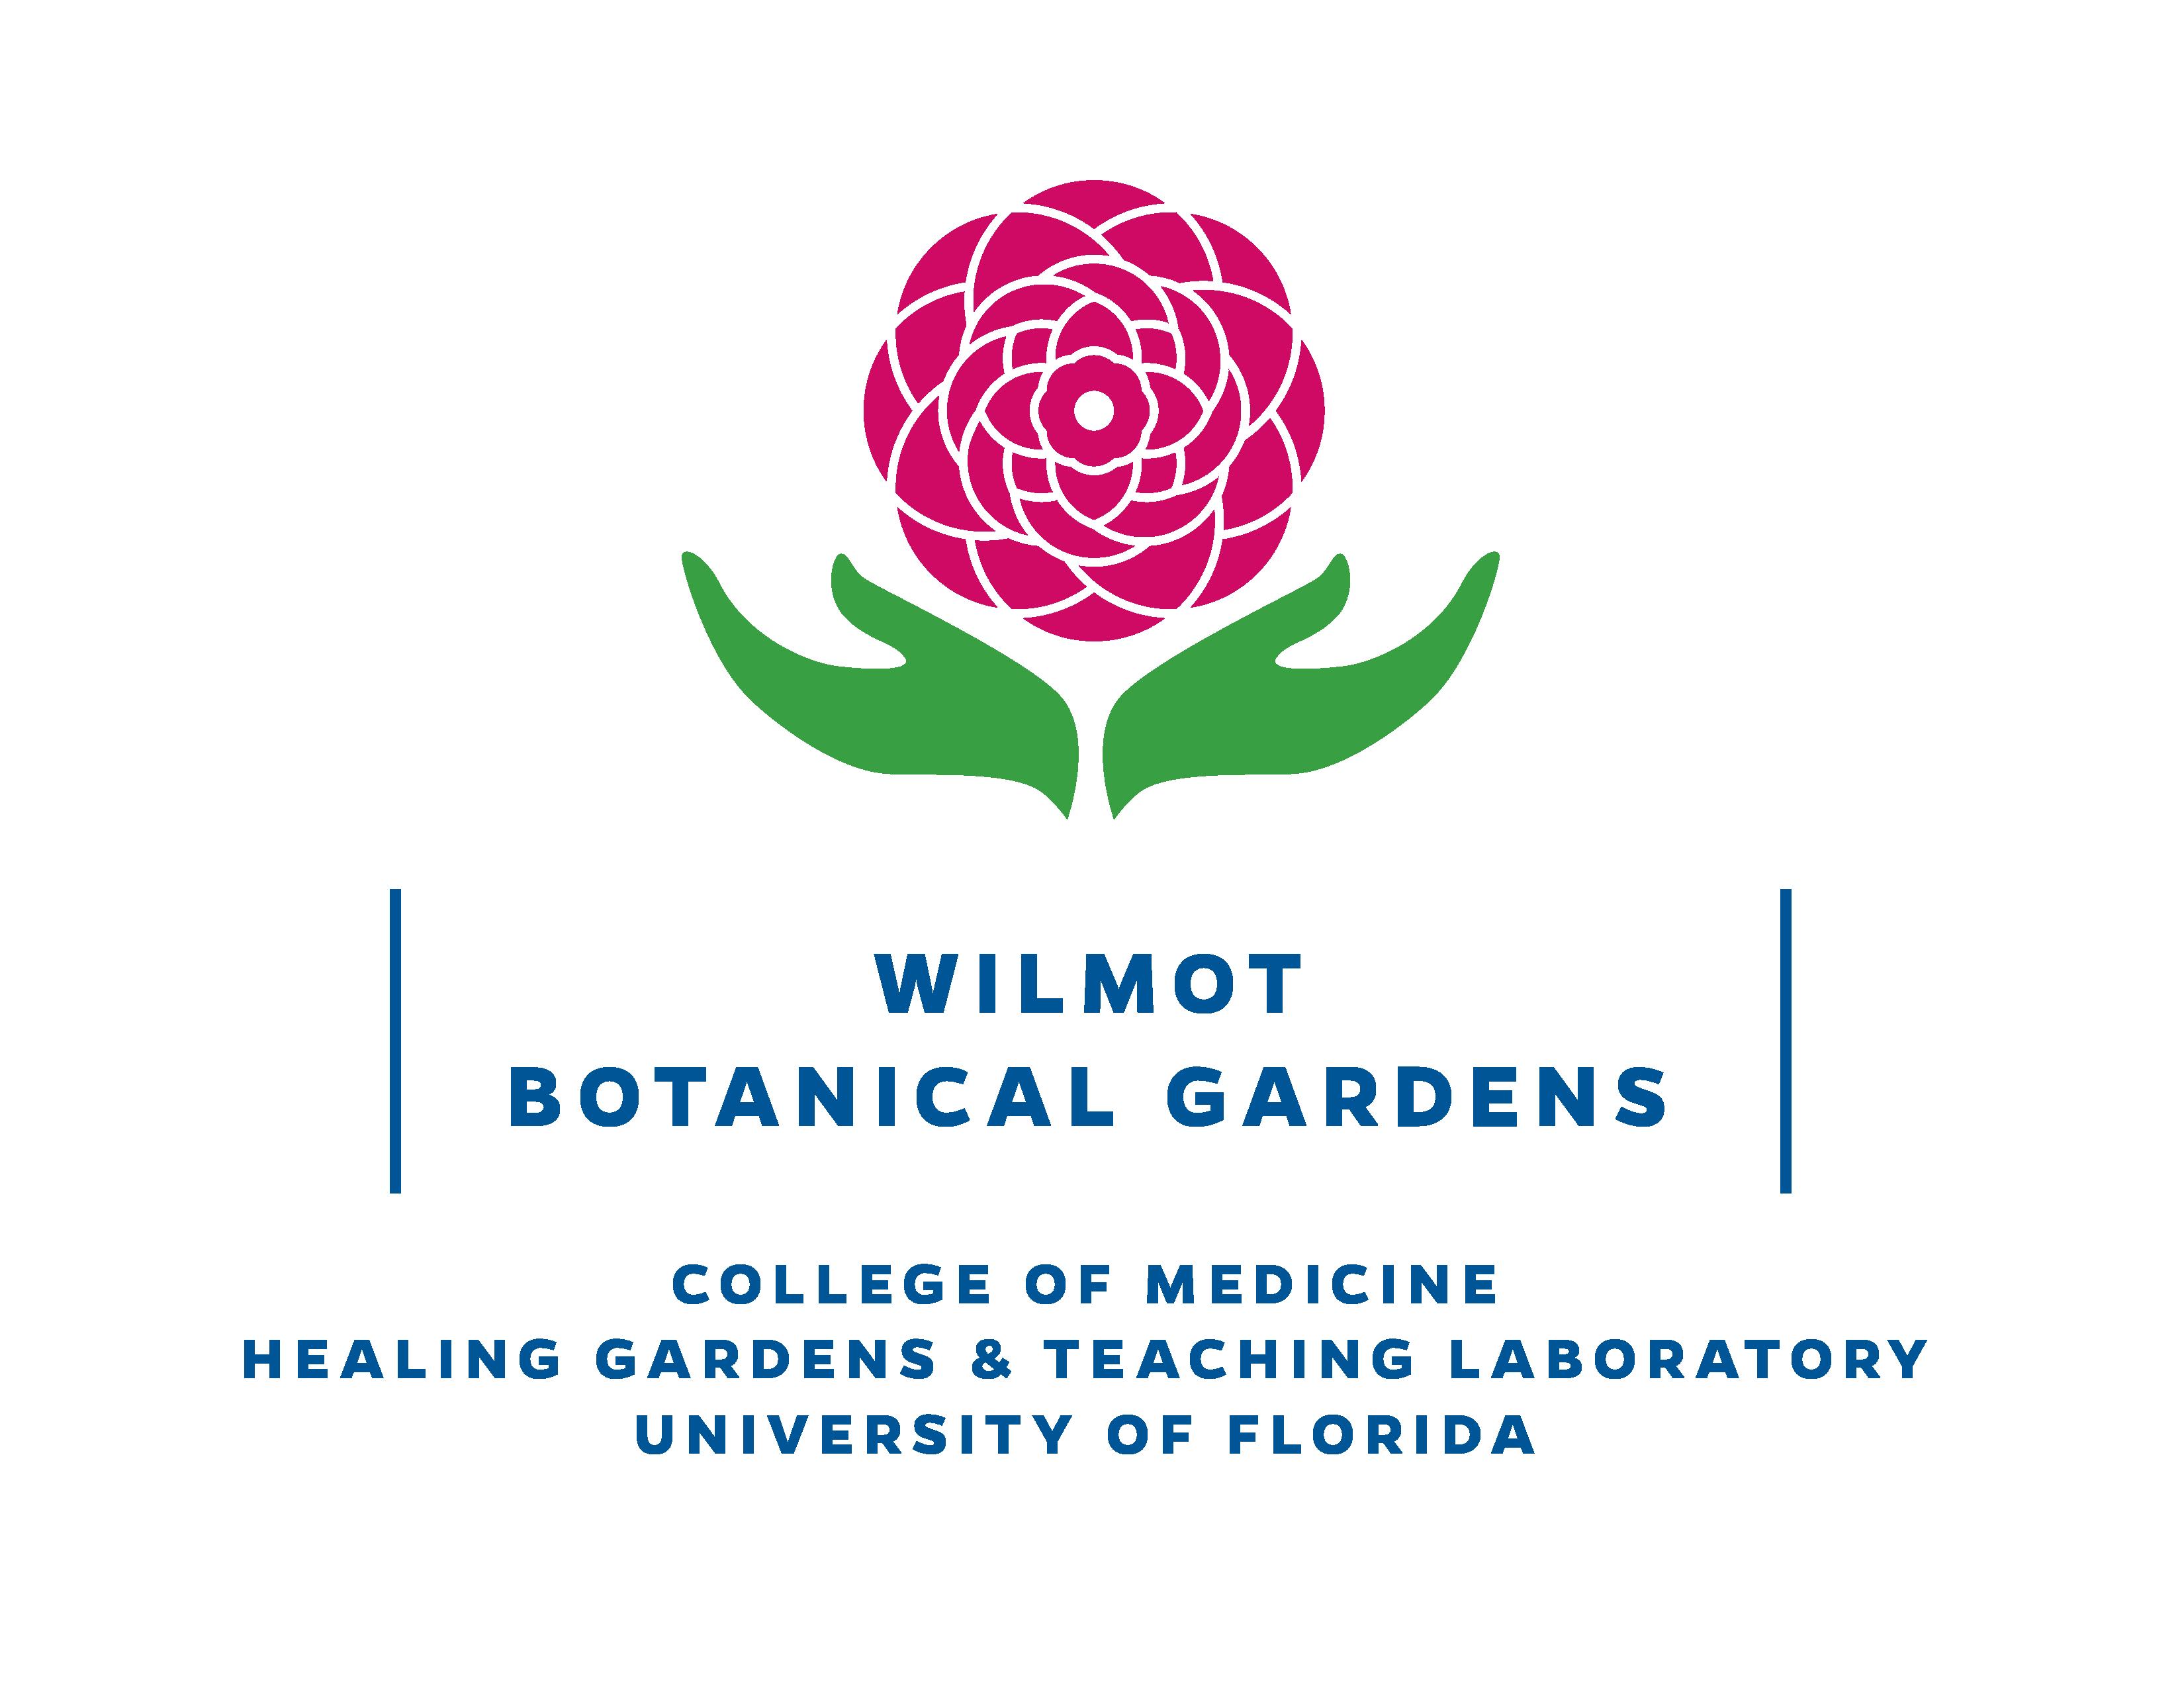 LATEST EDITION: Wilmot Botanical Gardens Newsletter